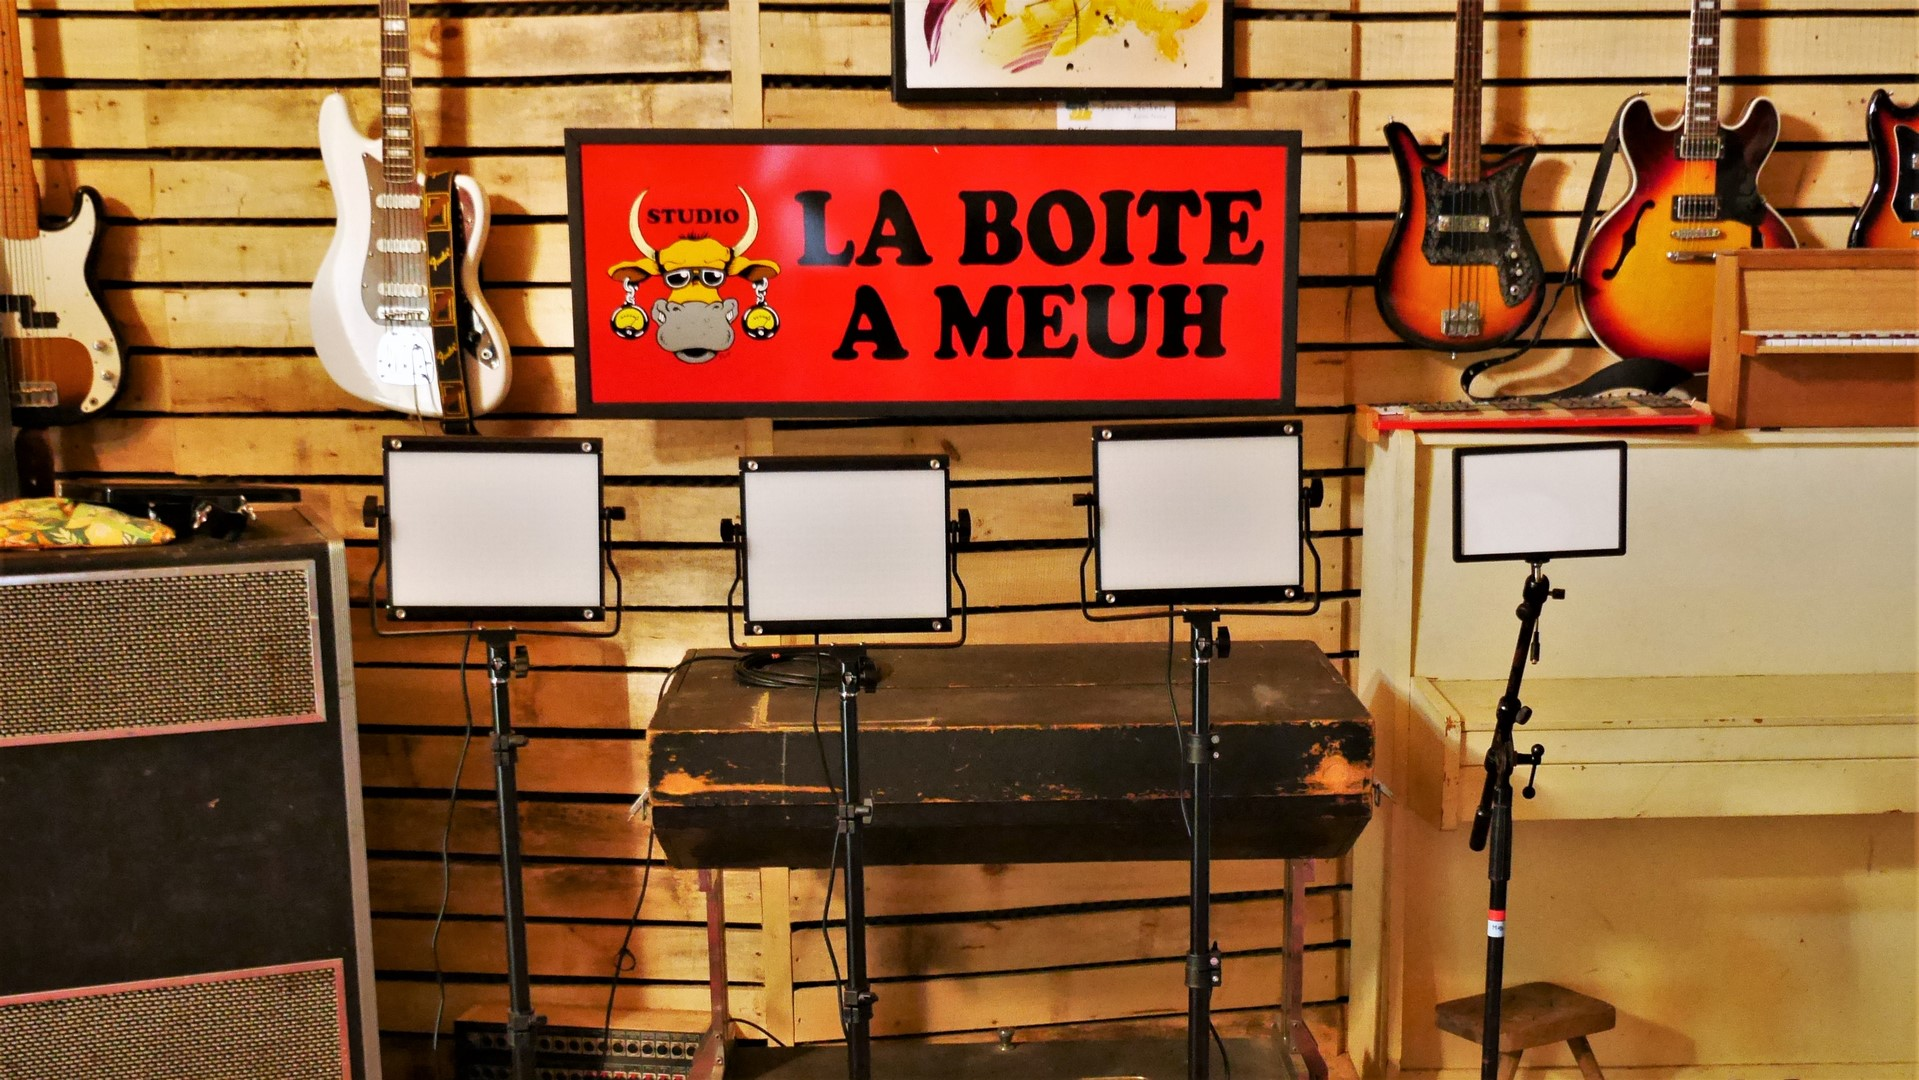 studio-la-boite-a-meuh-panneaux-led-video